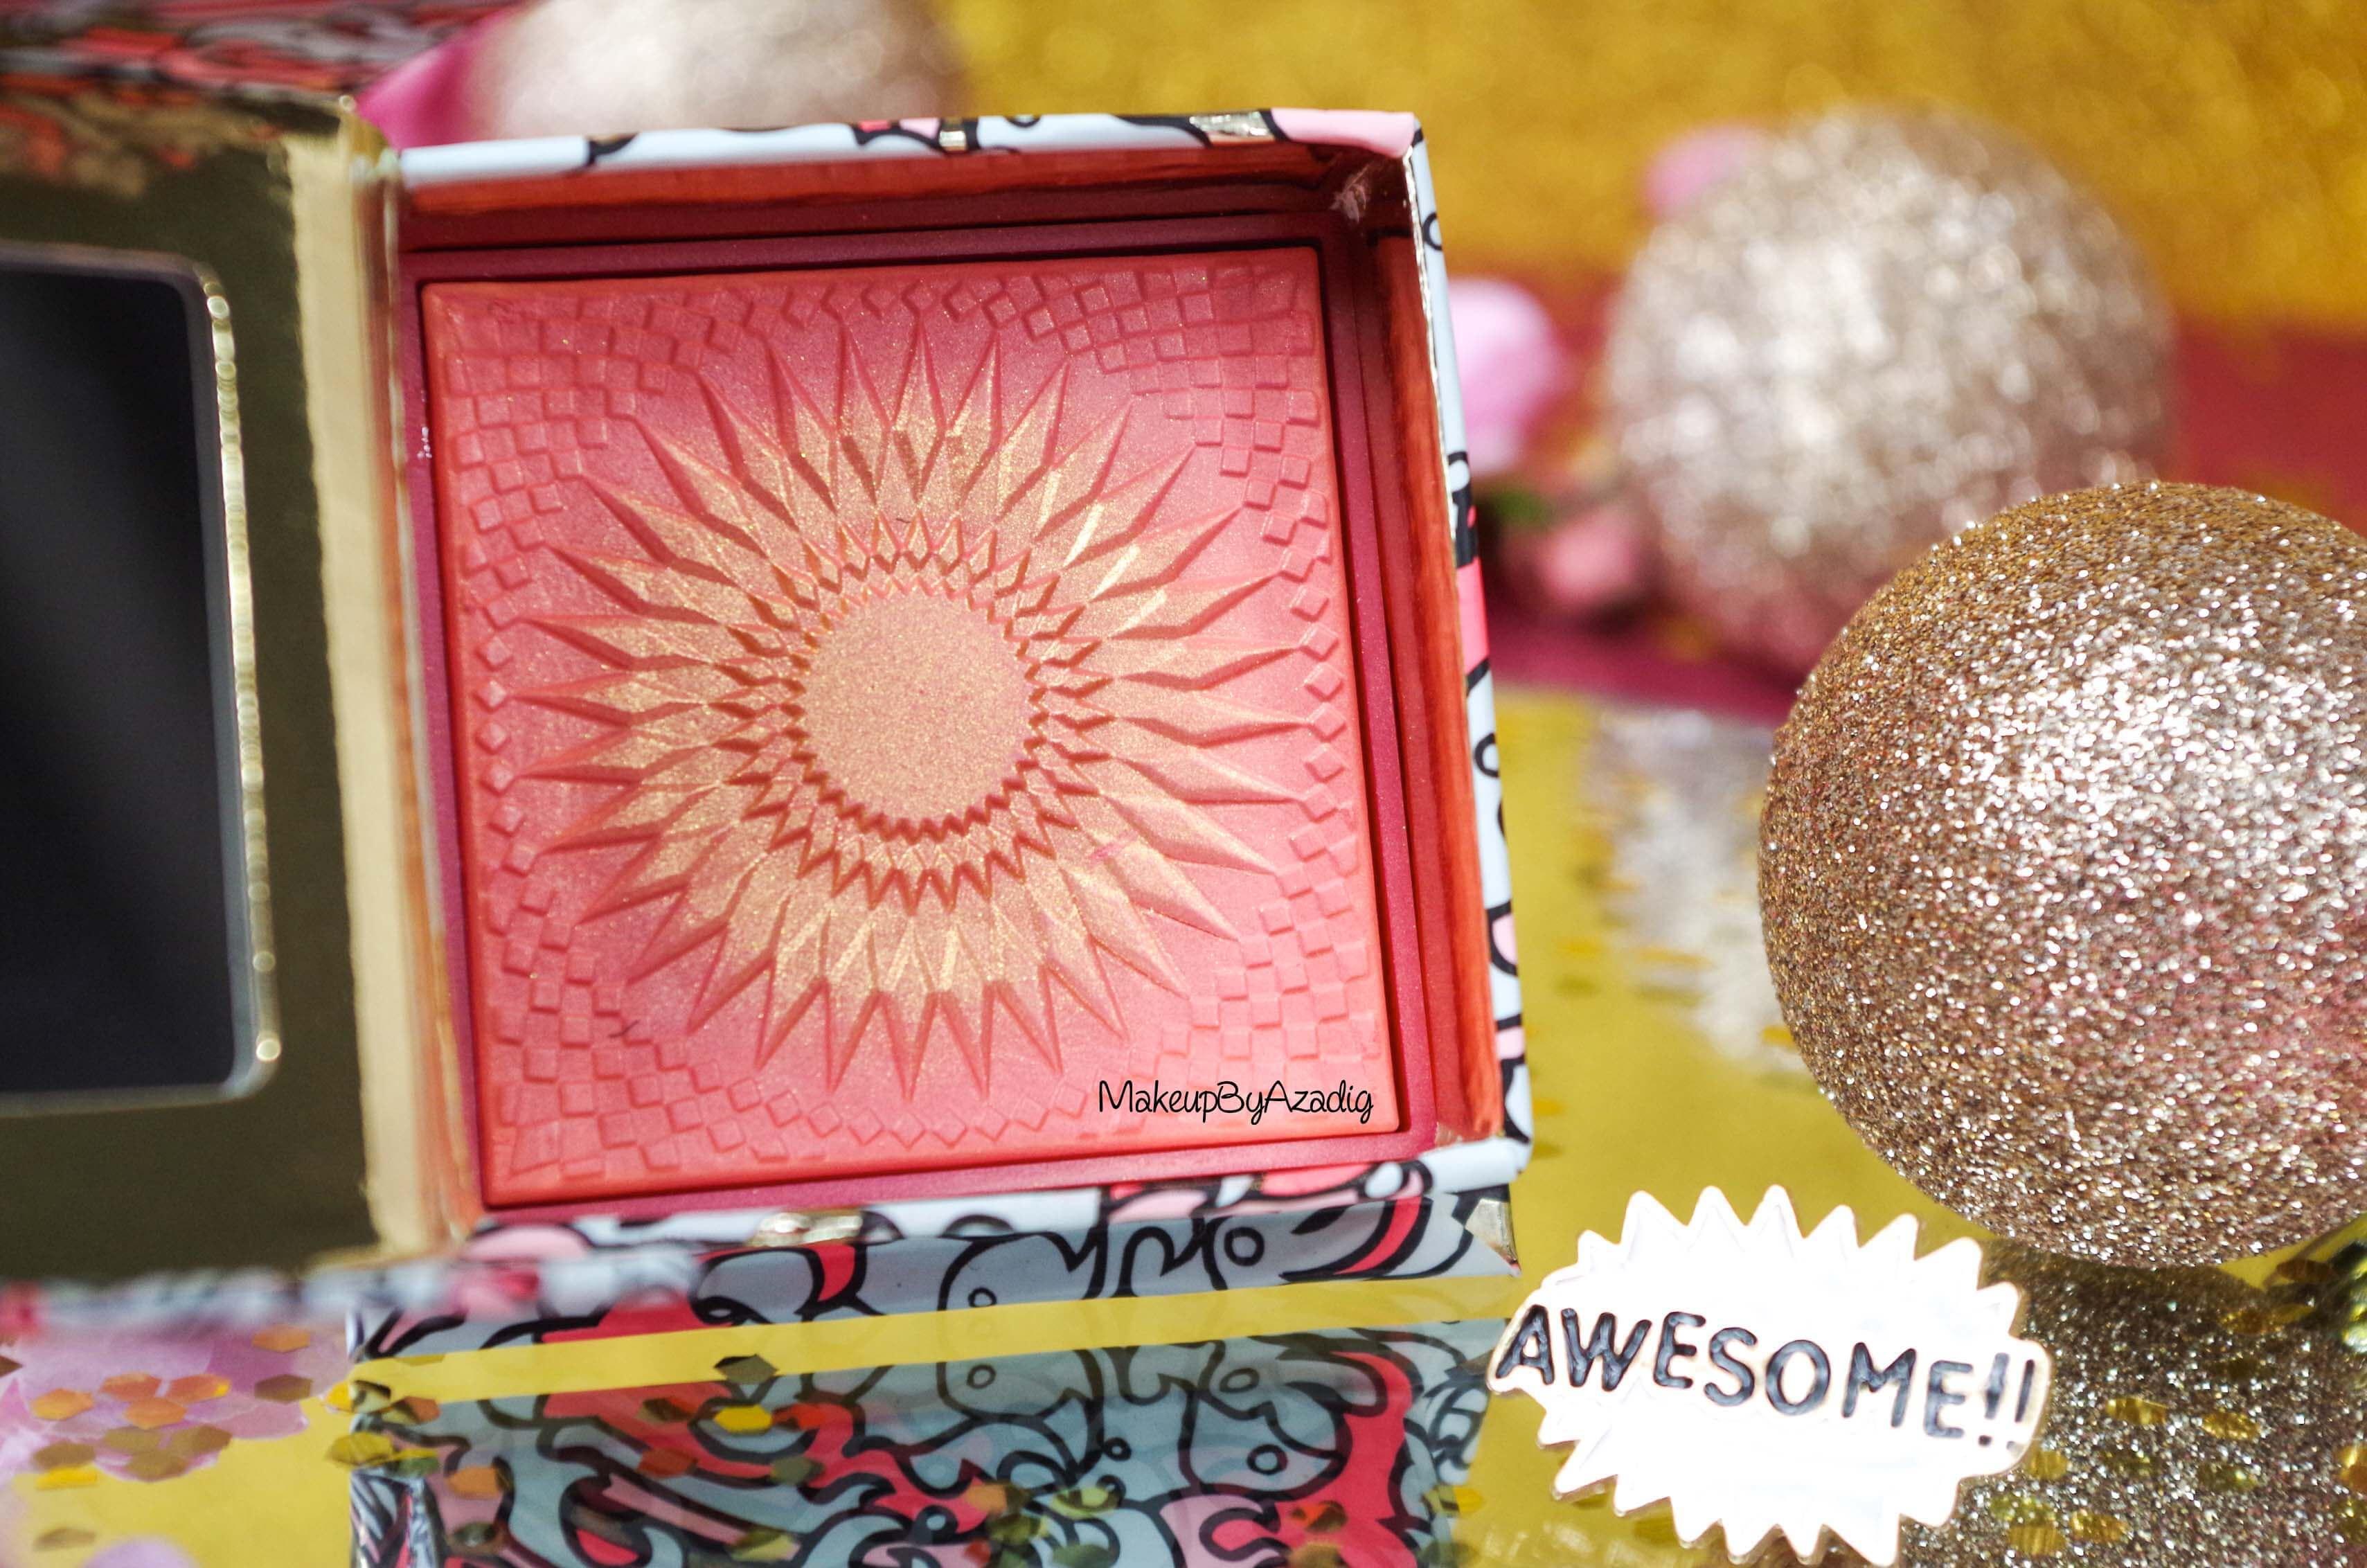 soleil-revue-review-blush-benefit-galifornia-san-francisco-sunny-golden-pink-blush-avis-prix-sephora-makeupbyazadig-coachella